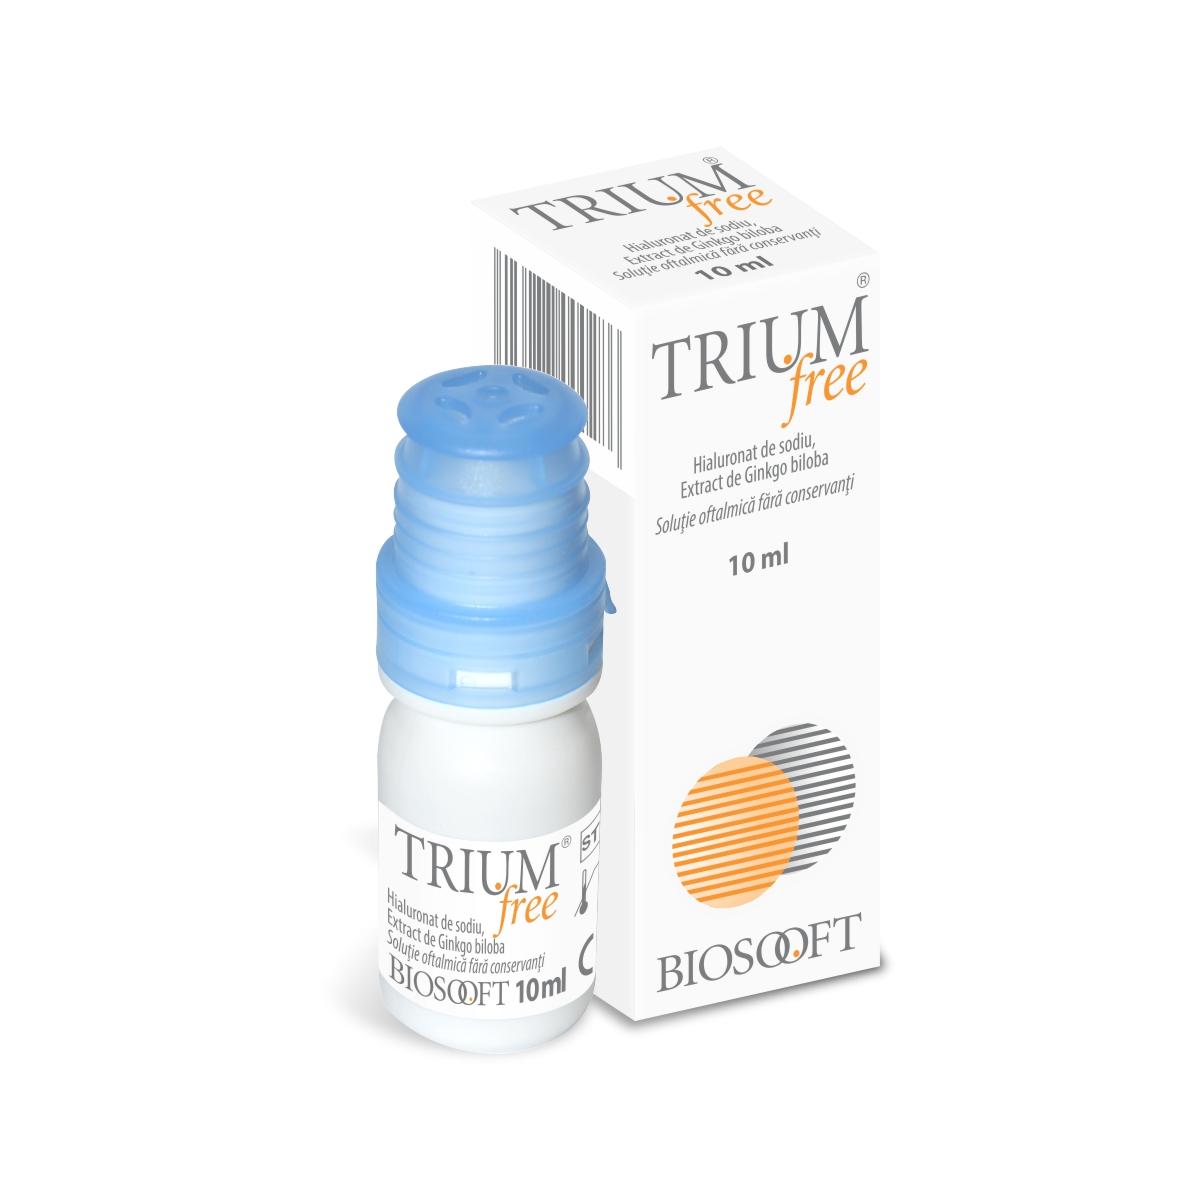 Trium free picaturi oftalmice, 10 ml, BioSooft drmax.ro